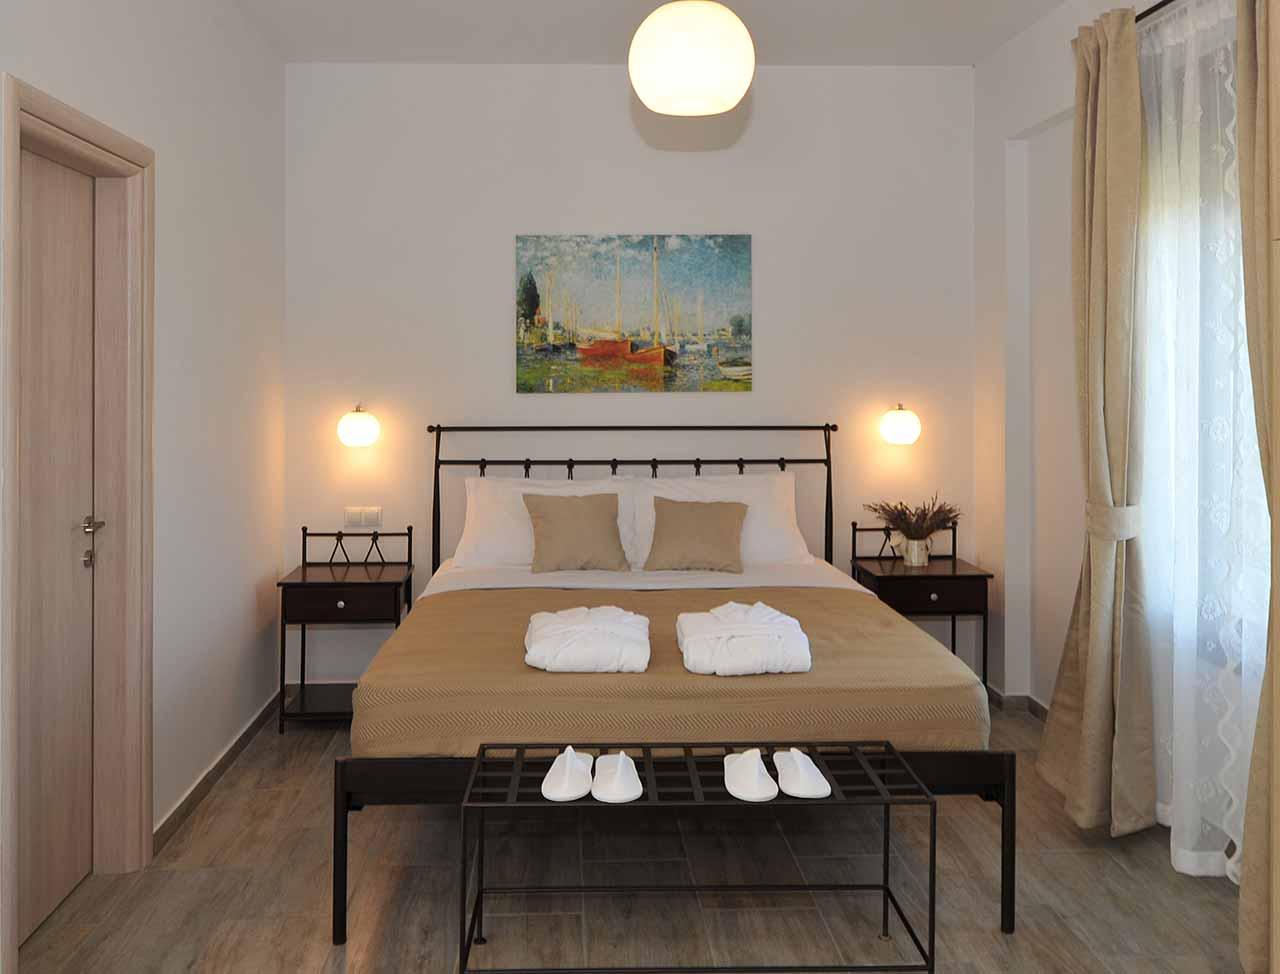 ikaria olivia villas - villa Agrelia bedroom